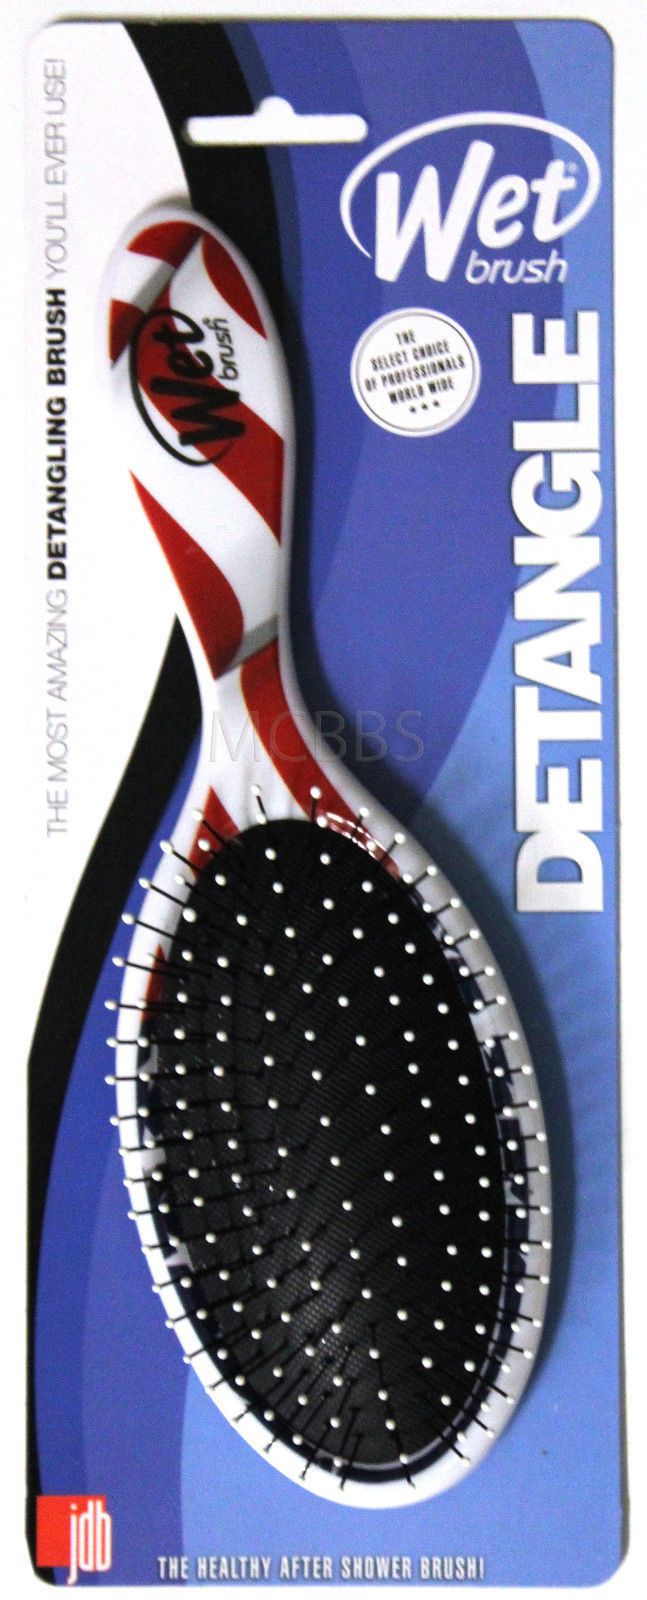 Jdb Wet Brush Usa American Flag Patriot Edition Best Detangling Brush America